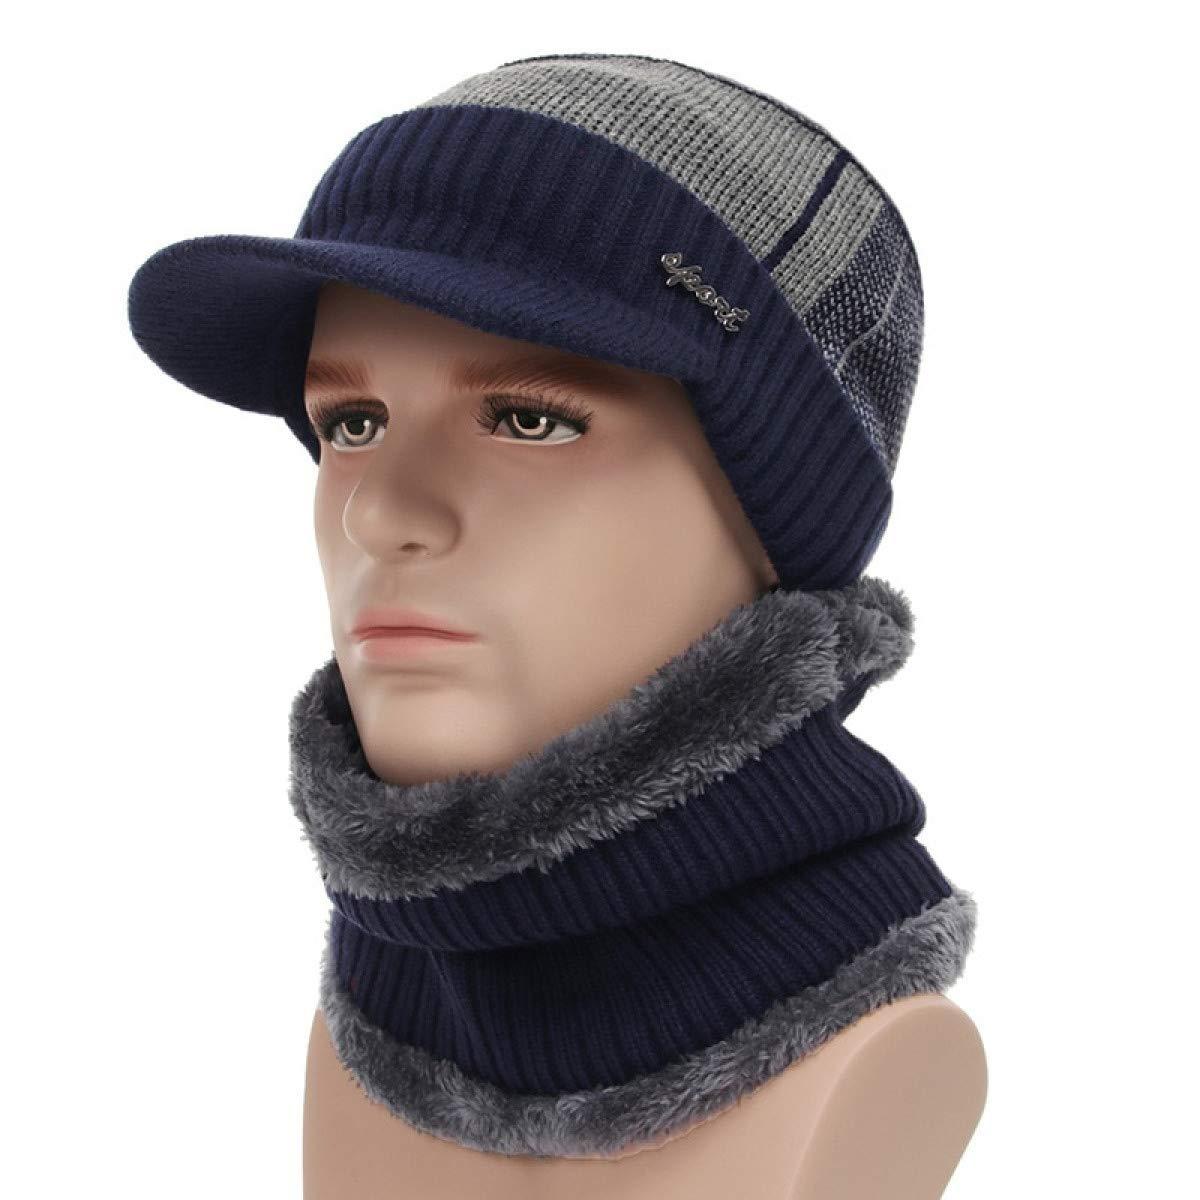 Amazon.com: WEEKEND SHOP Winter Hats for Men Skullies Beanie Hat Winter Cap Men Women Wool Scarf Caps Set Balaclava Mask Gorras Bonnet Knitted Hat Color 3: ...